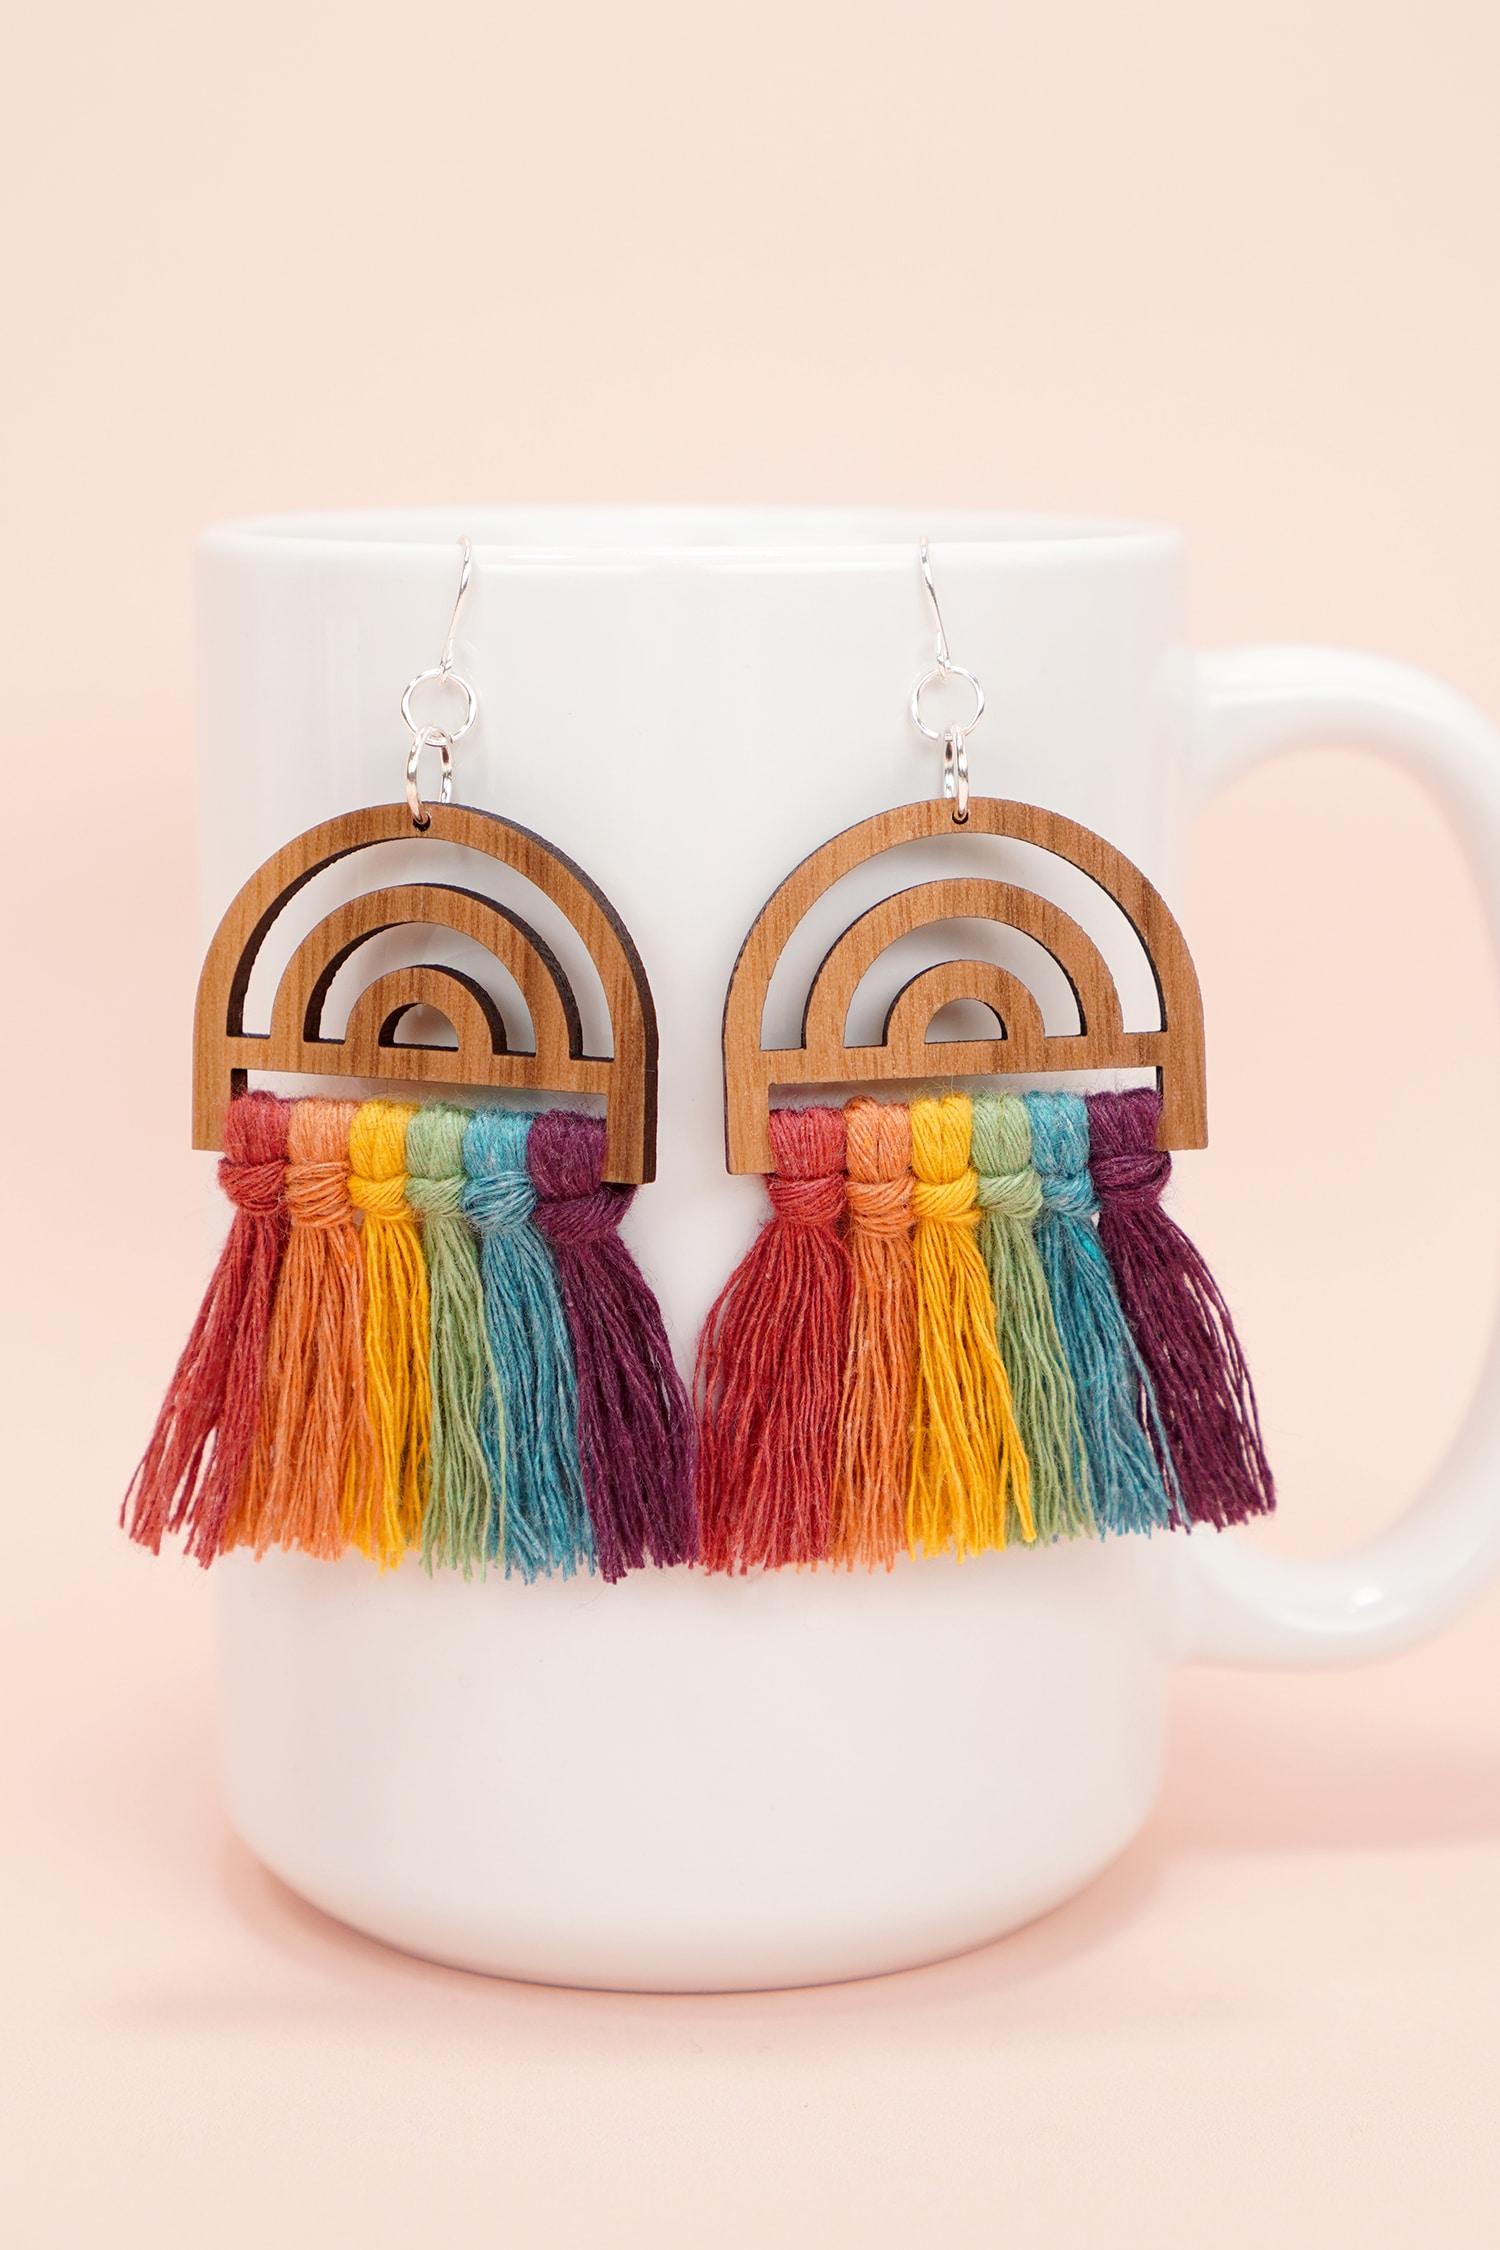 colorful wooden rainbow macrame earrings on white mug on peach background